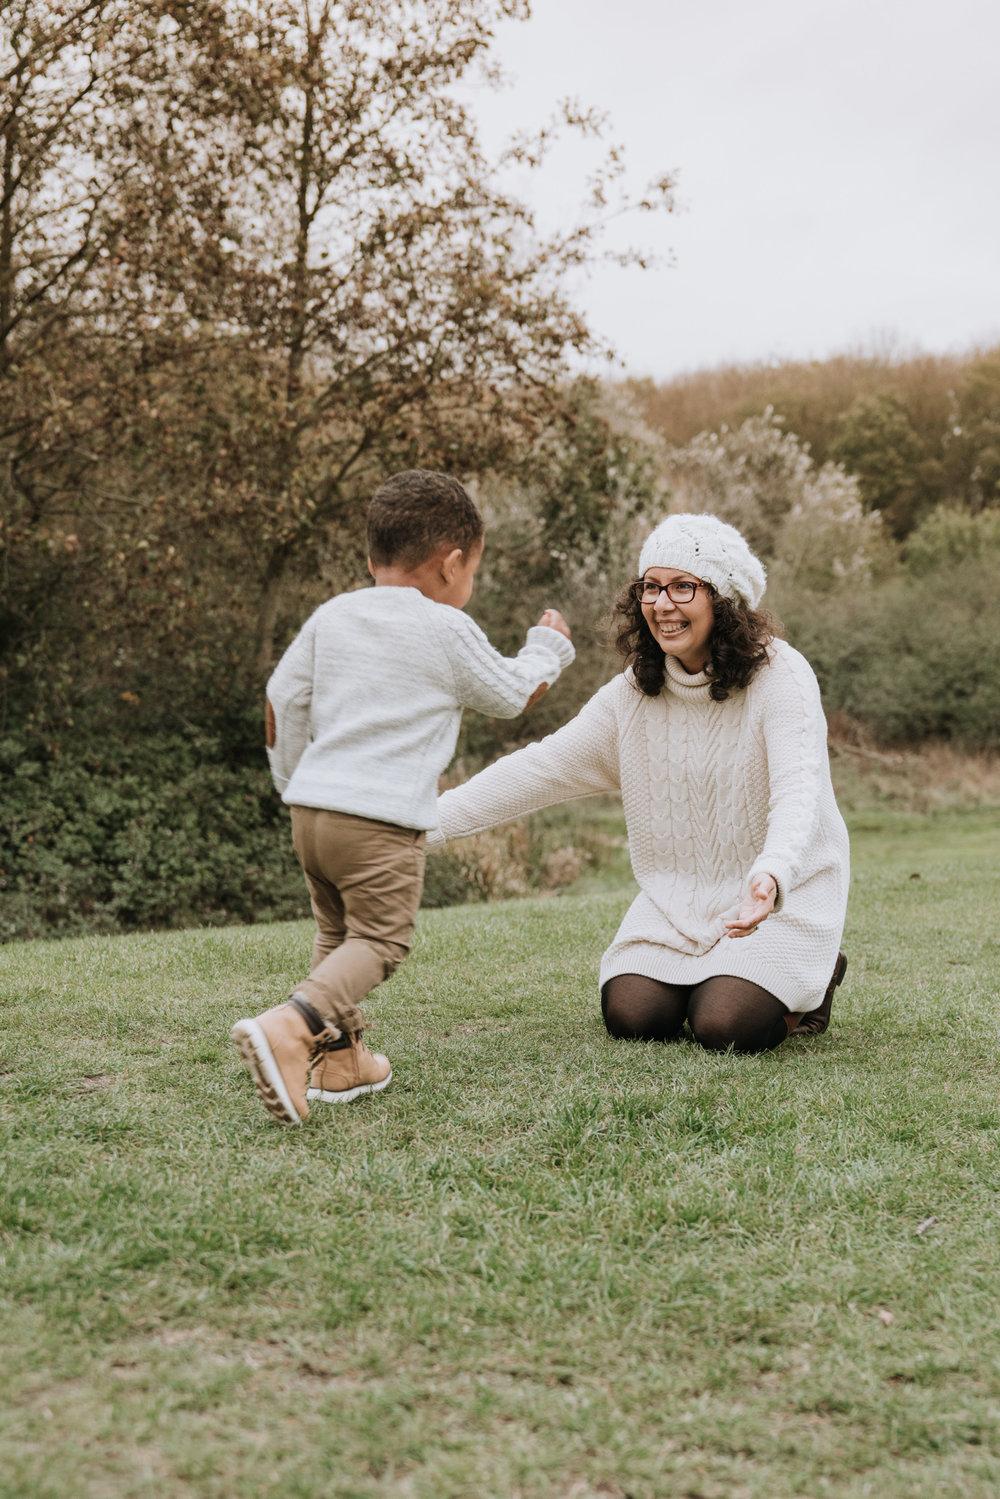 Grace-Elizabeth-Woodland-Family-Photography-Lifestyle-Essex-Norfolk-Suffolk-19.jpg